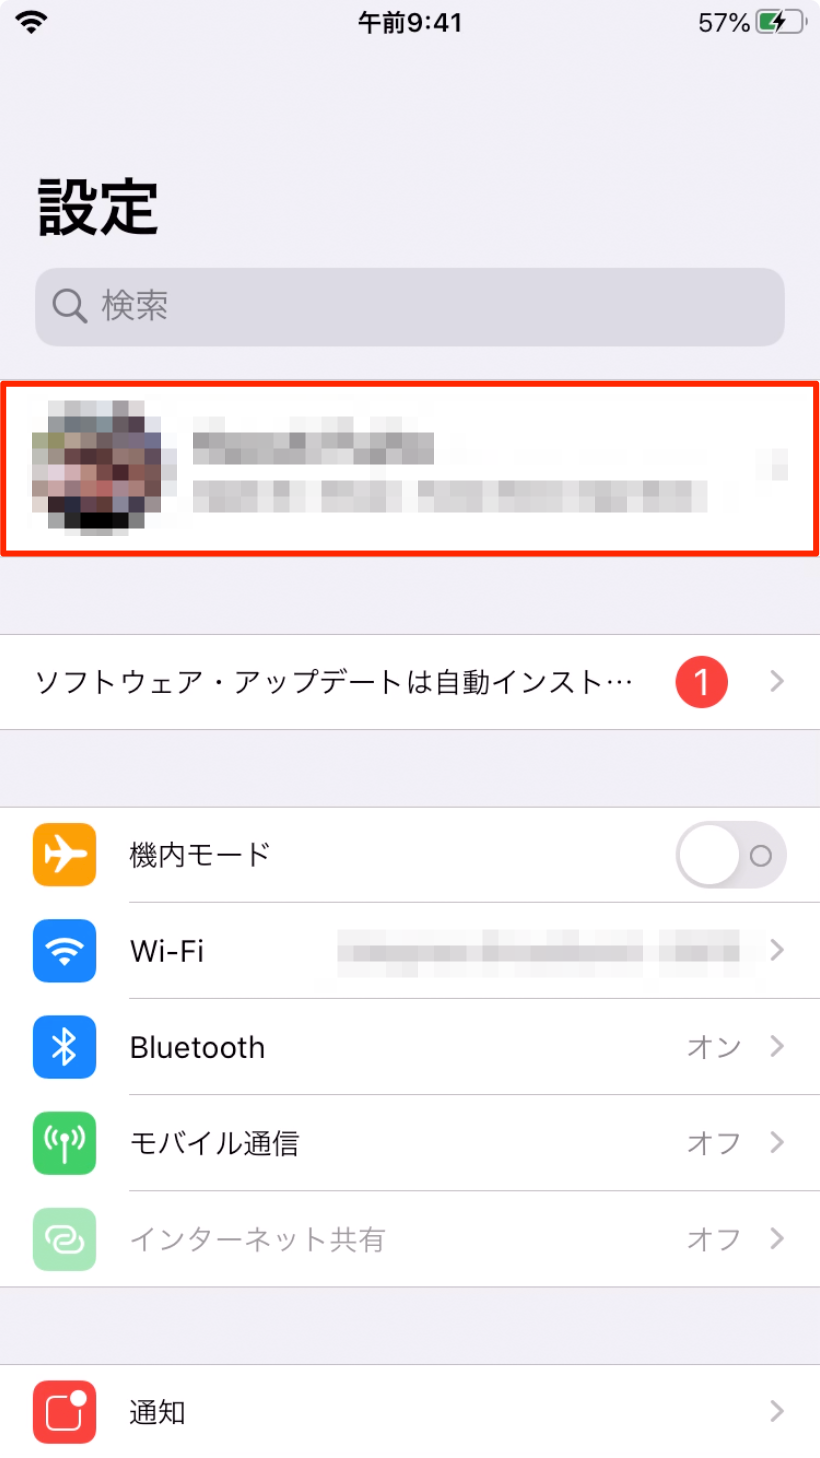 """iCloudを使ったバックアップ方法"""